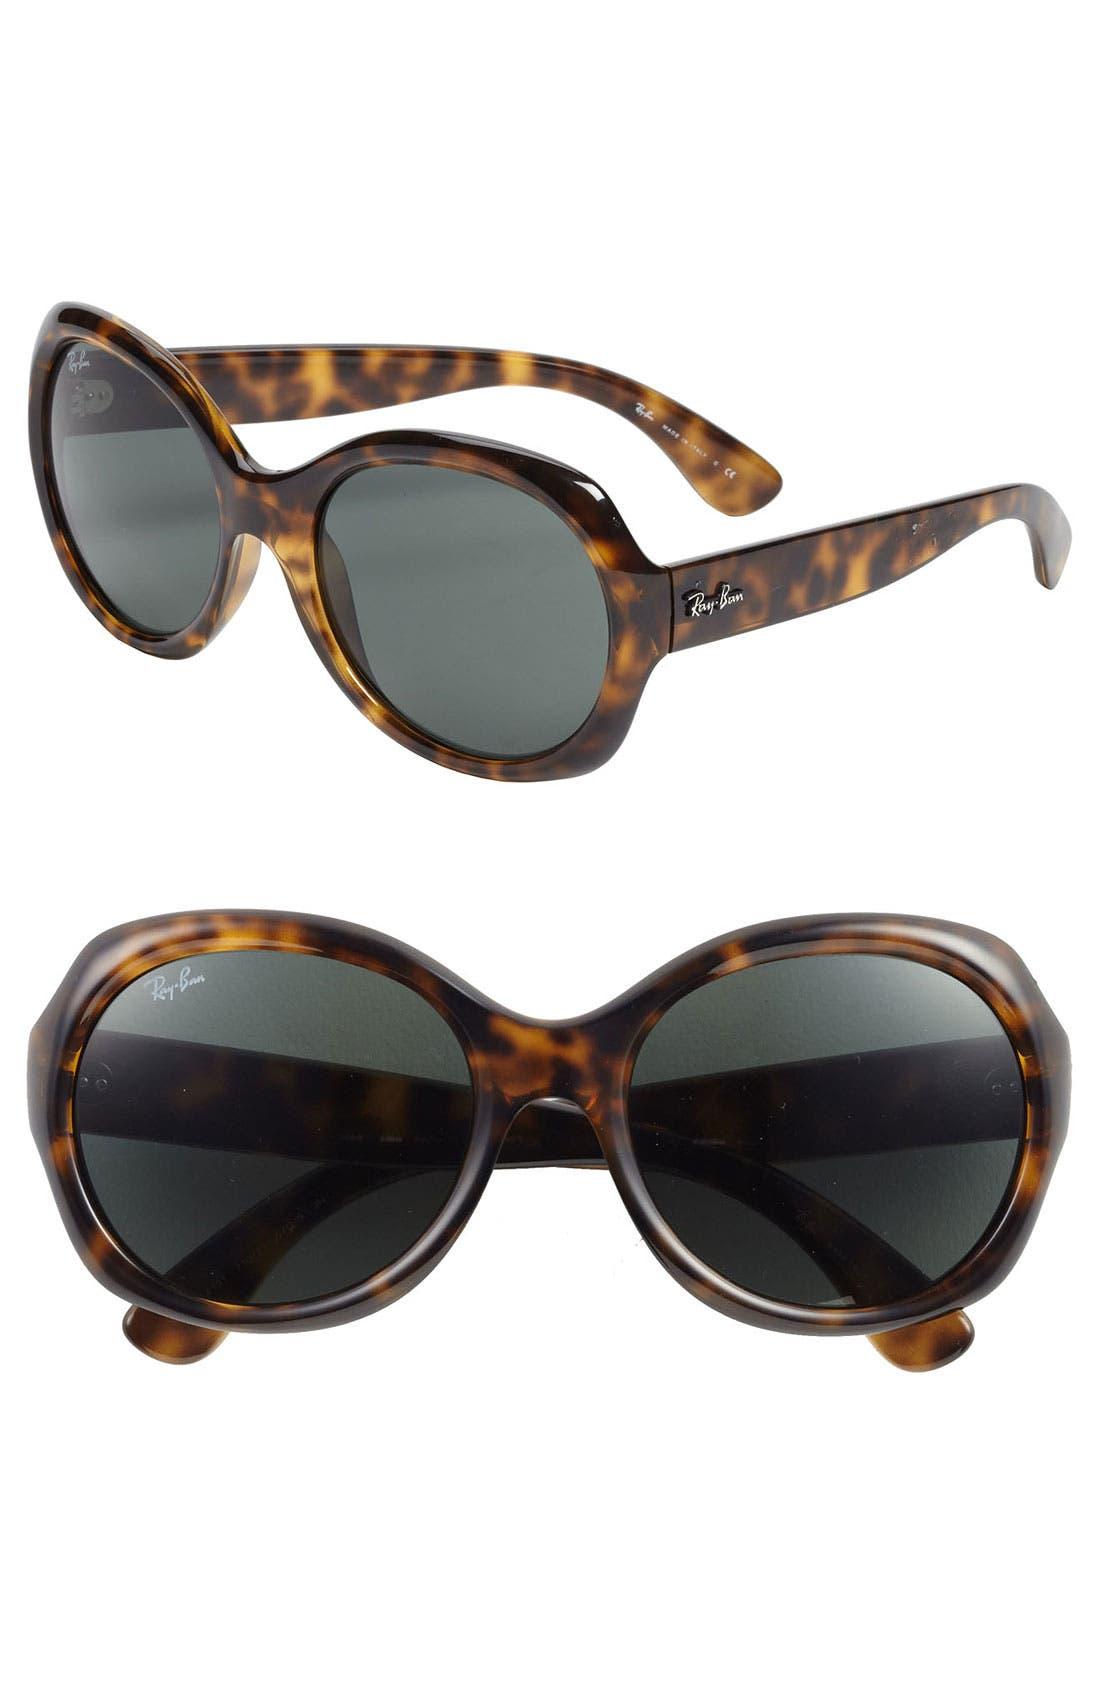 Main Image - Ray-Ban 'Round Glamour' 56mm Polarized Sunglasses